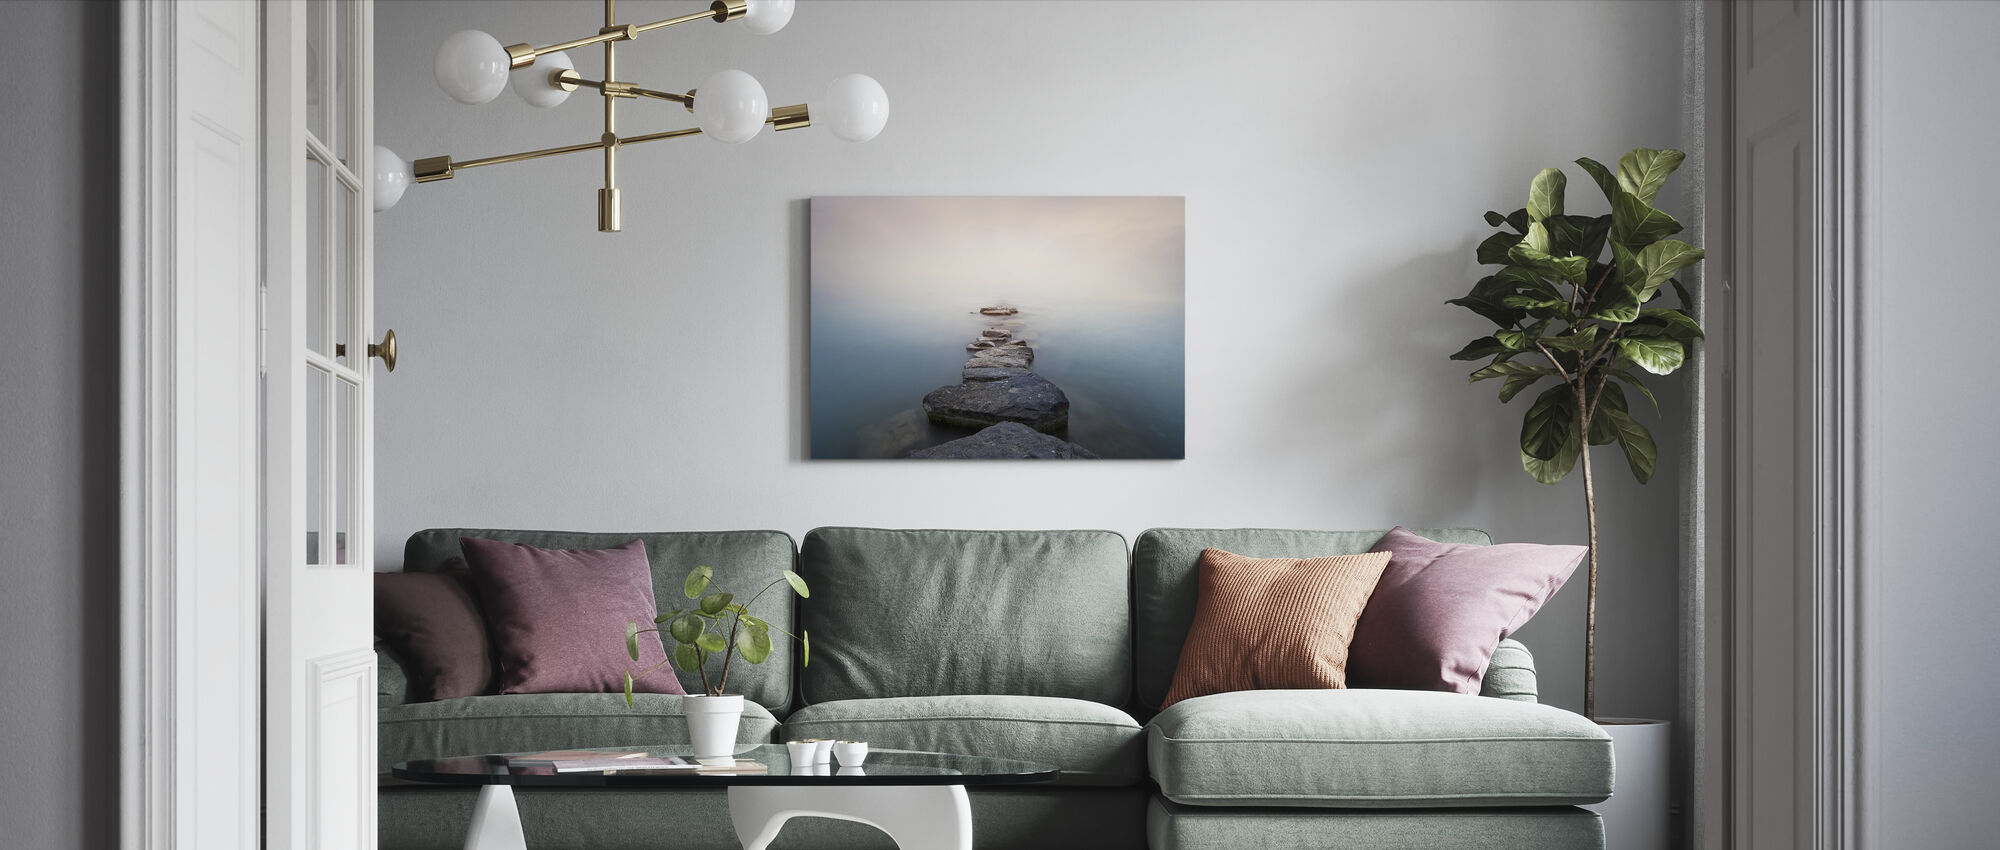 Stones - Canvas print - Living Room